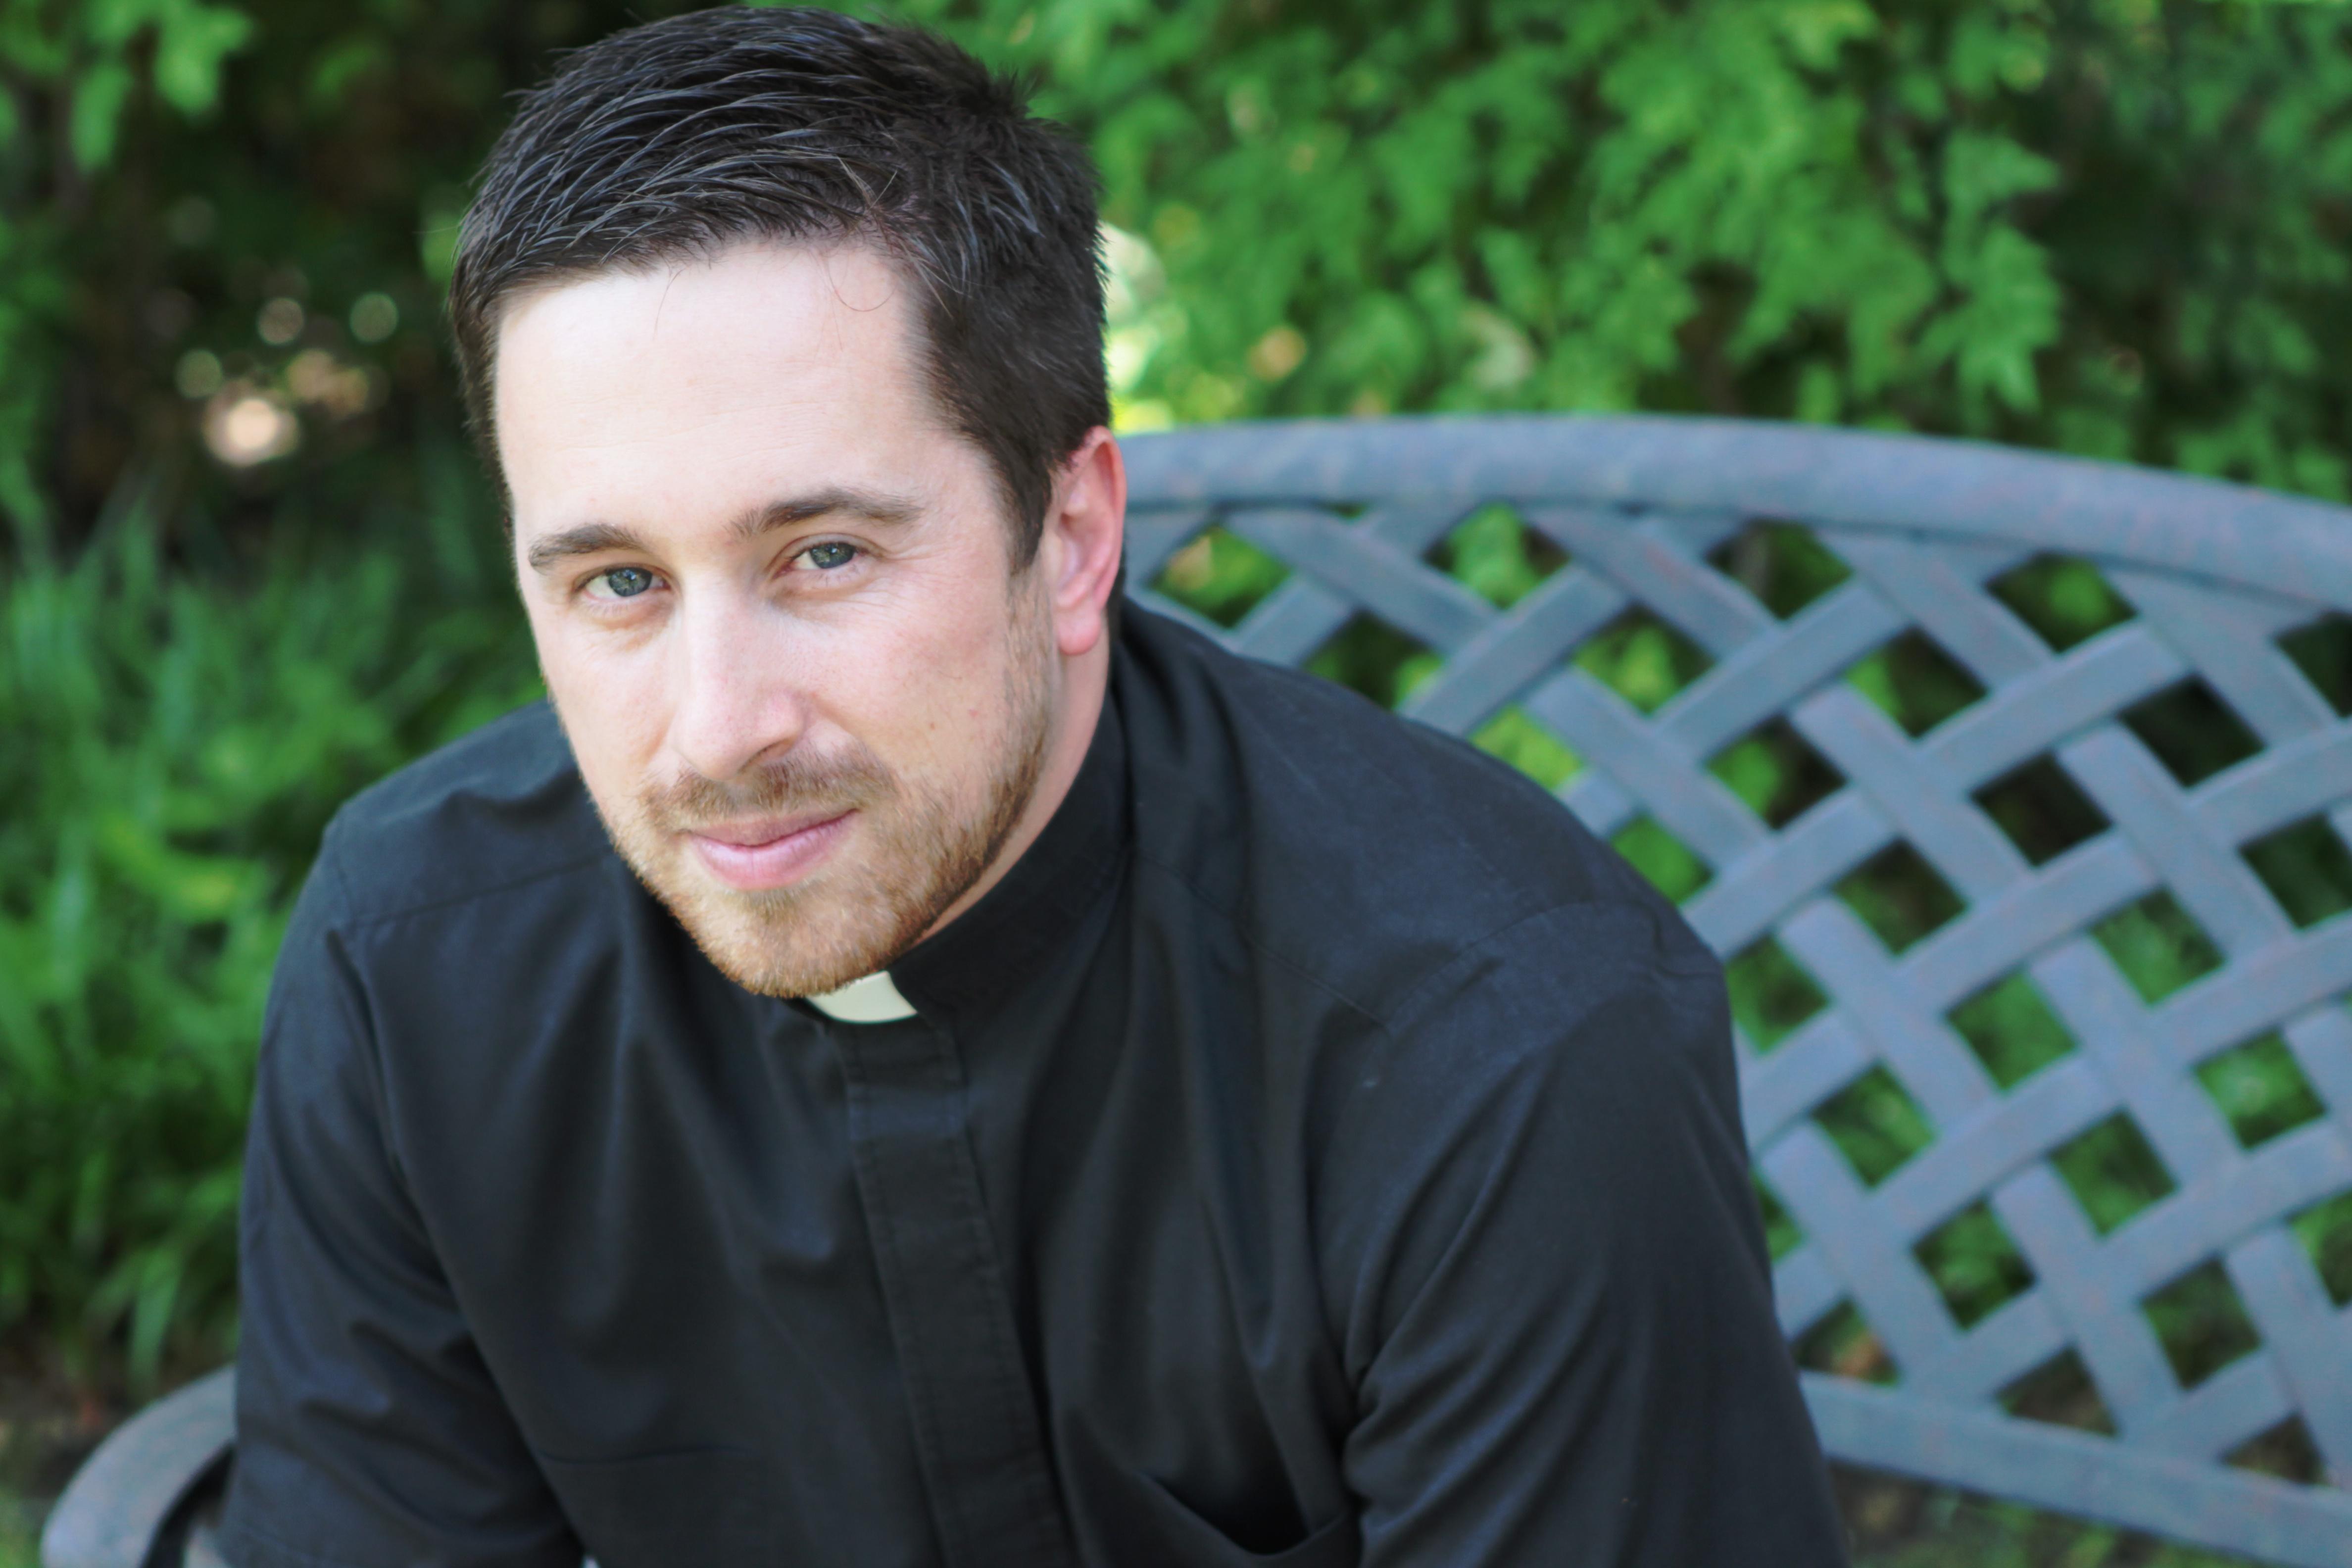 The Rev. Mike Baughman. Courtesy photo.